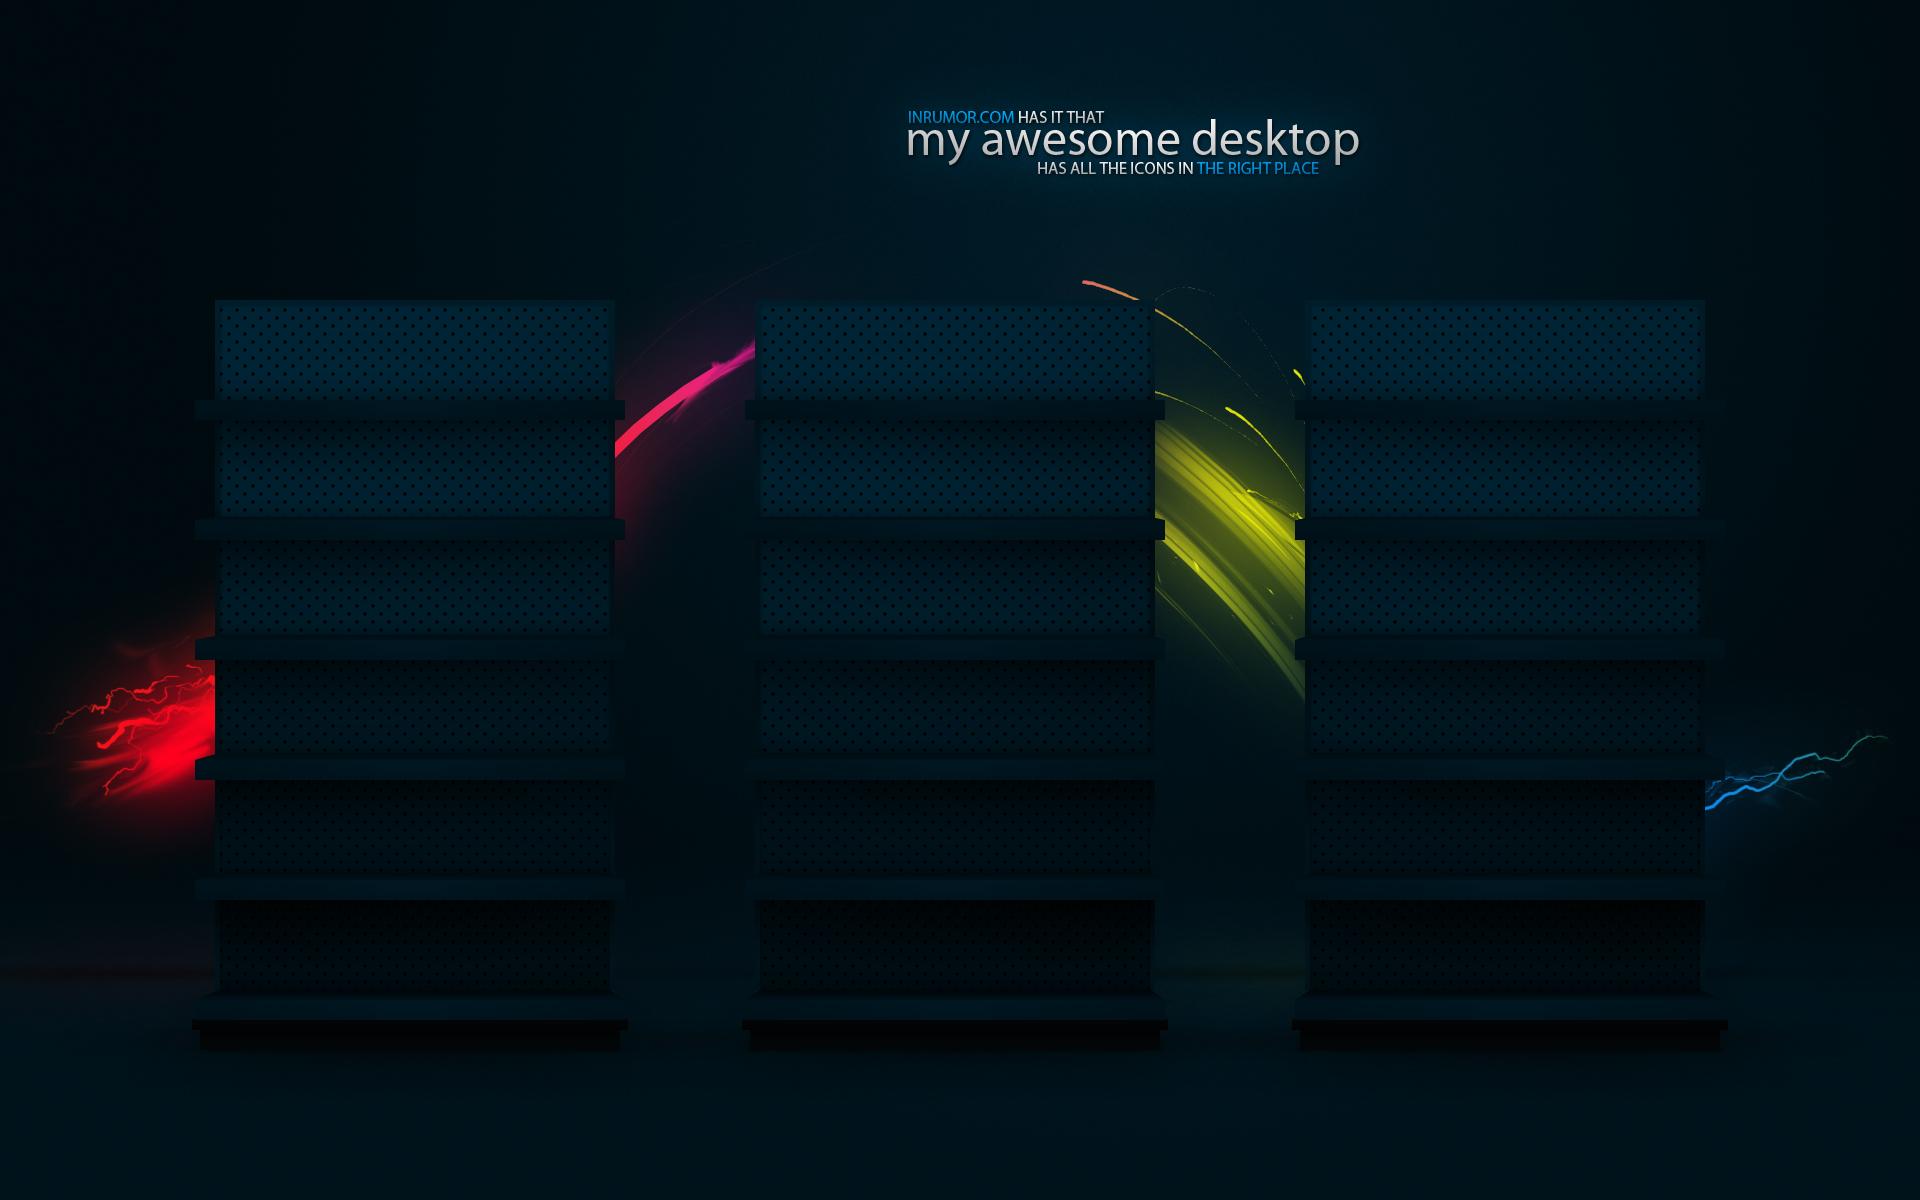 desktop icon wallpaper wallpapersafari